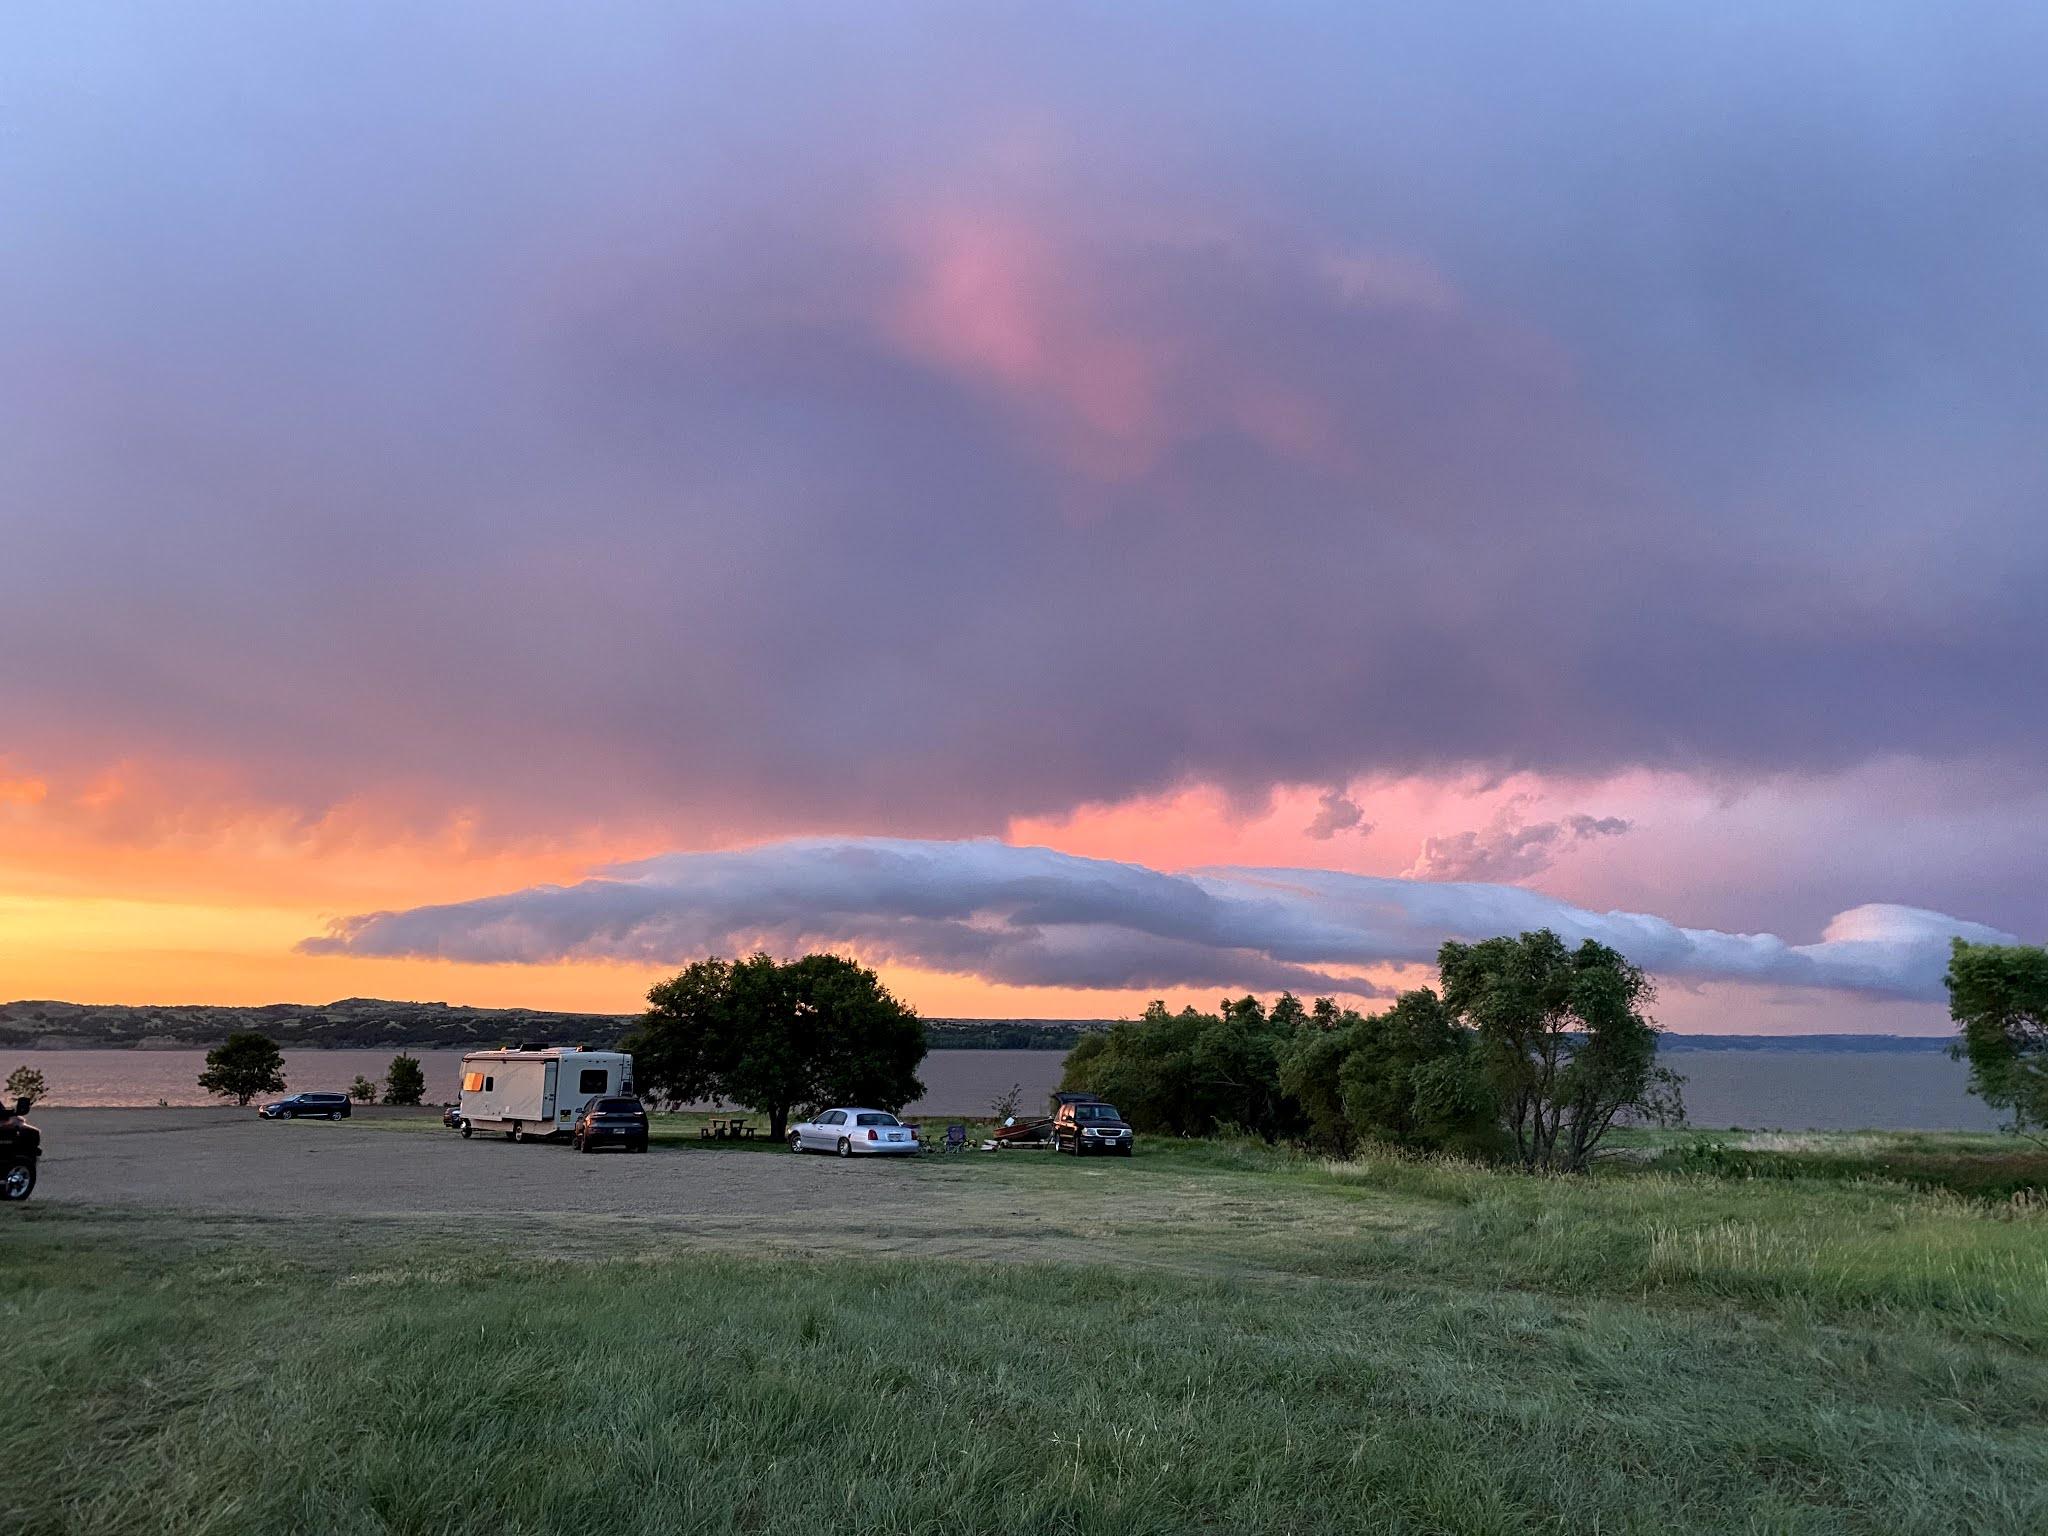 Sunrise on the Missouri River, South Dakota| biblio-style.com